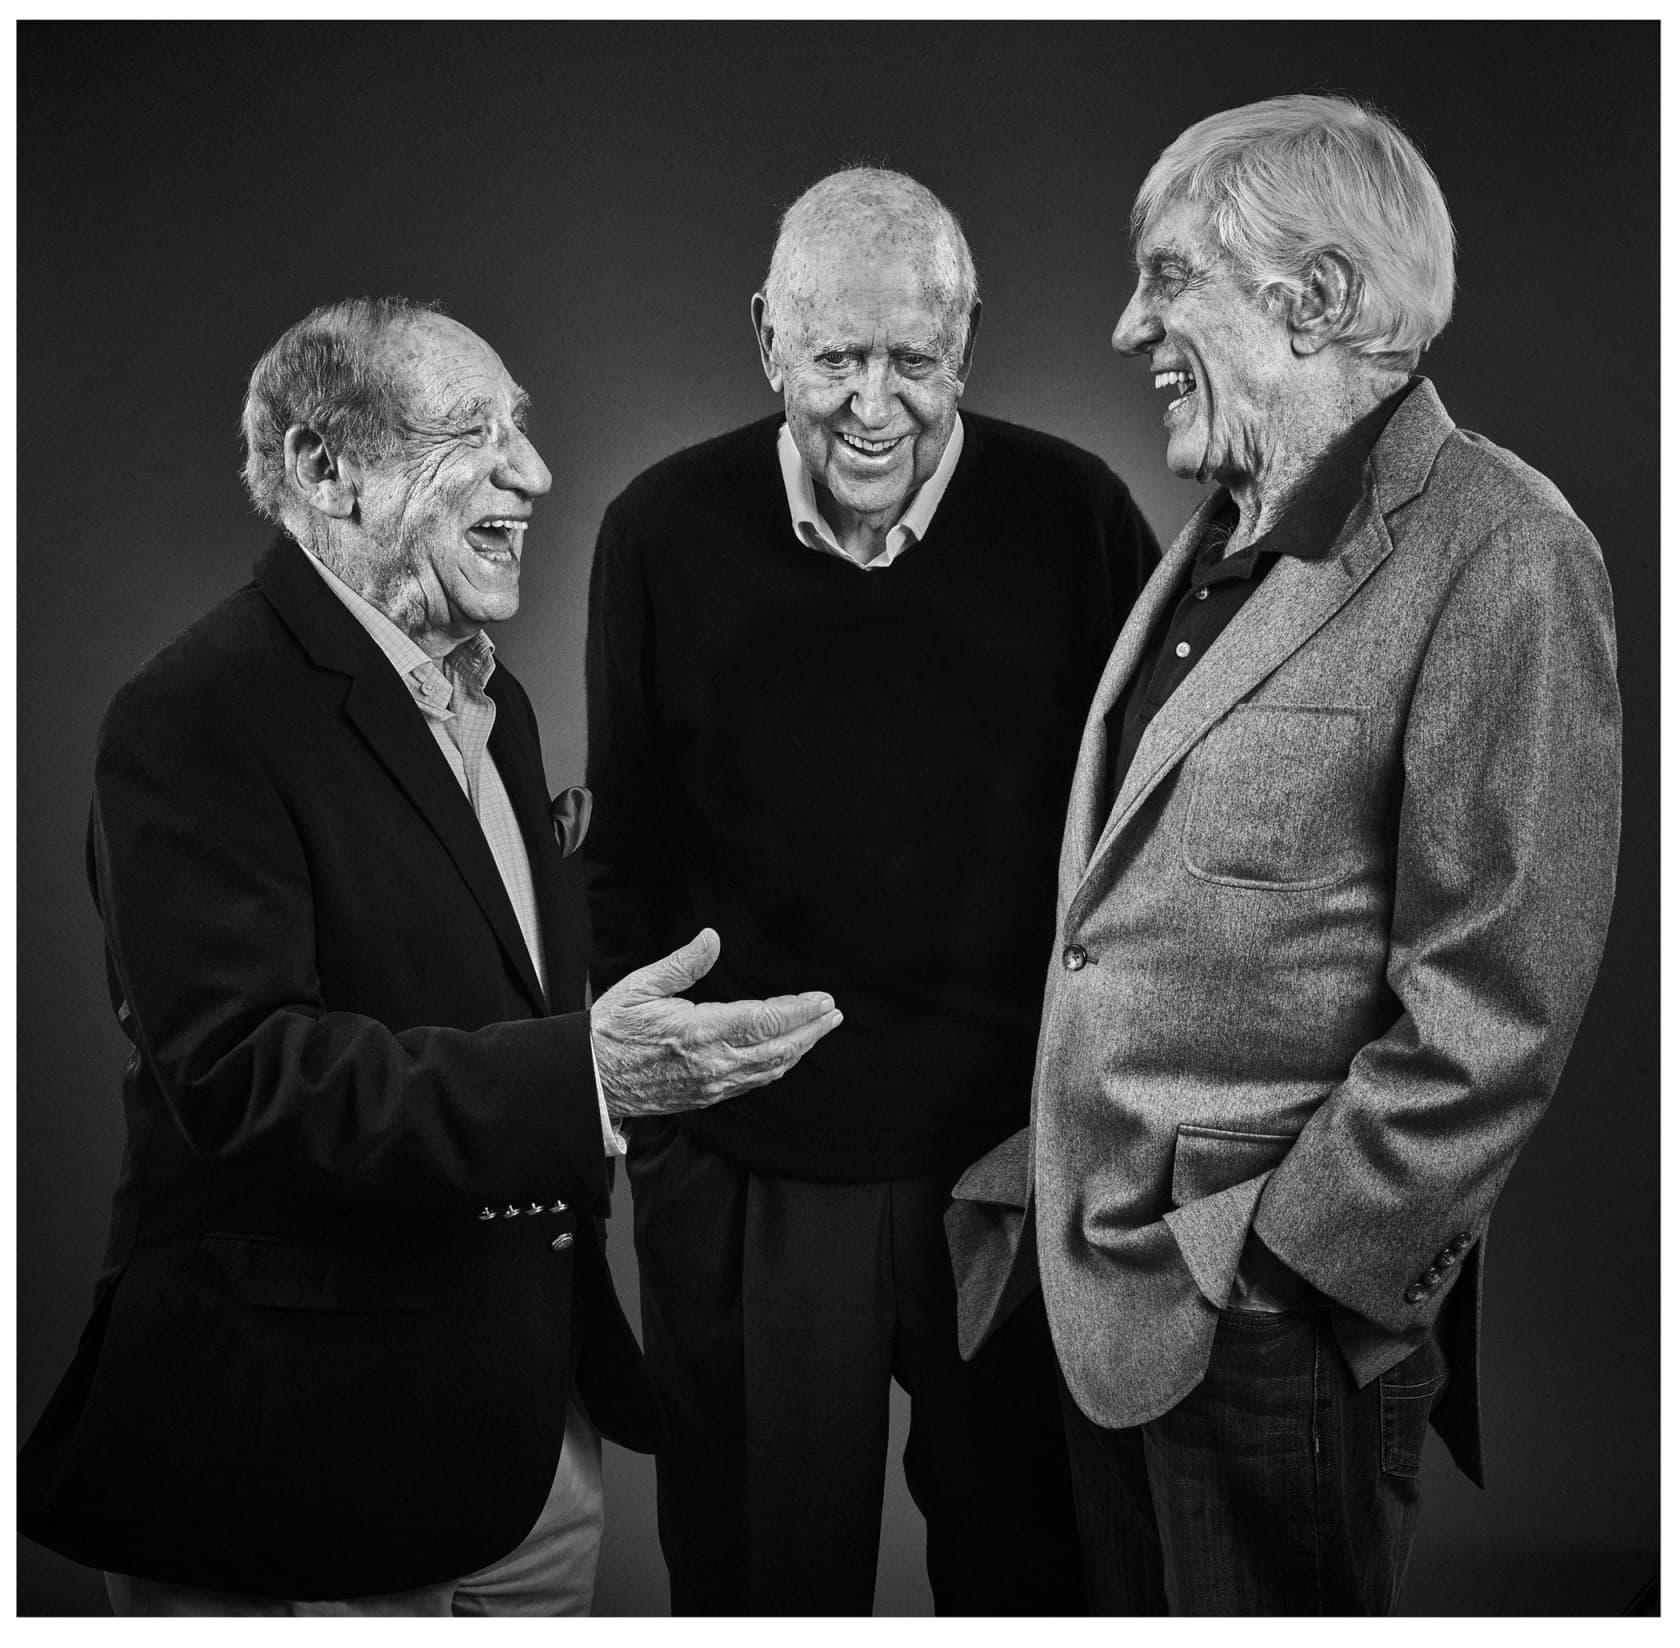 Andy Gotts Mel Brookes, Carl Reiner, Dick Van Dyke Fine Art Giclée Archival Print